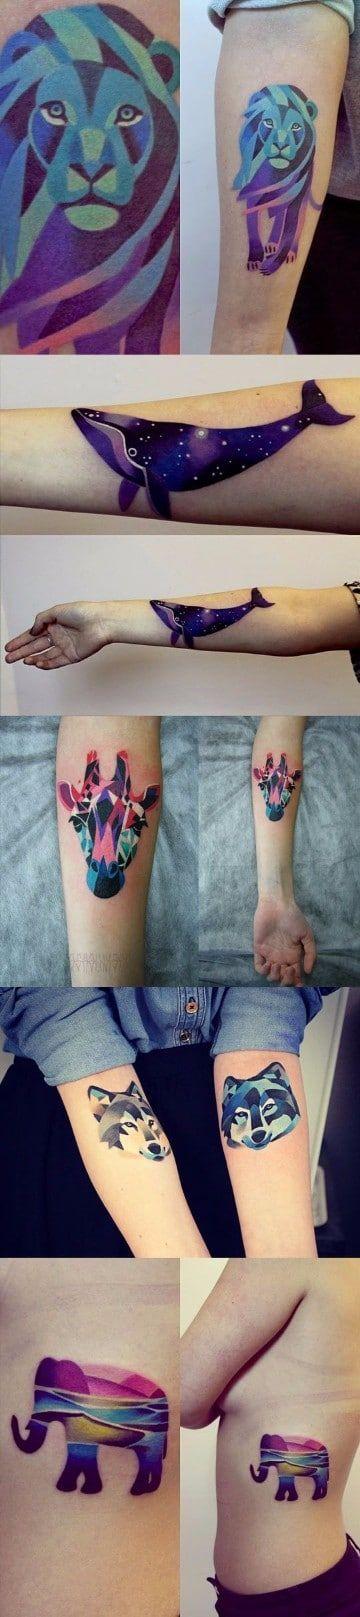 imagenes de tatuajes chingones para mujeres